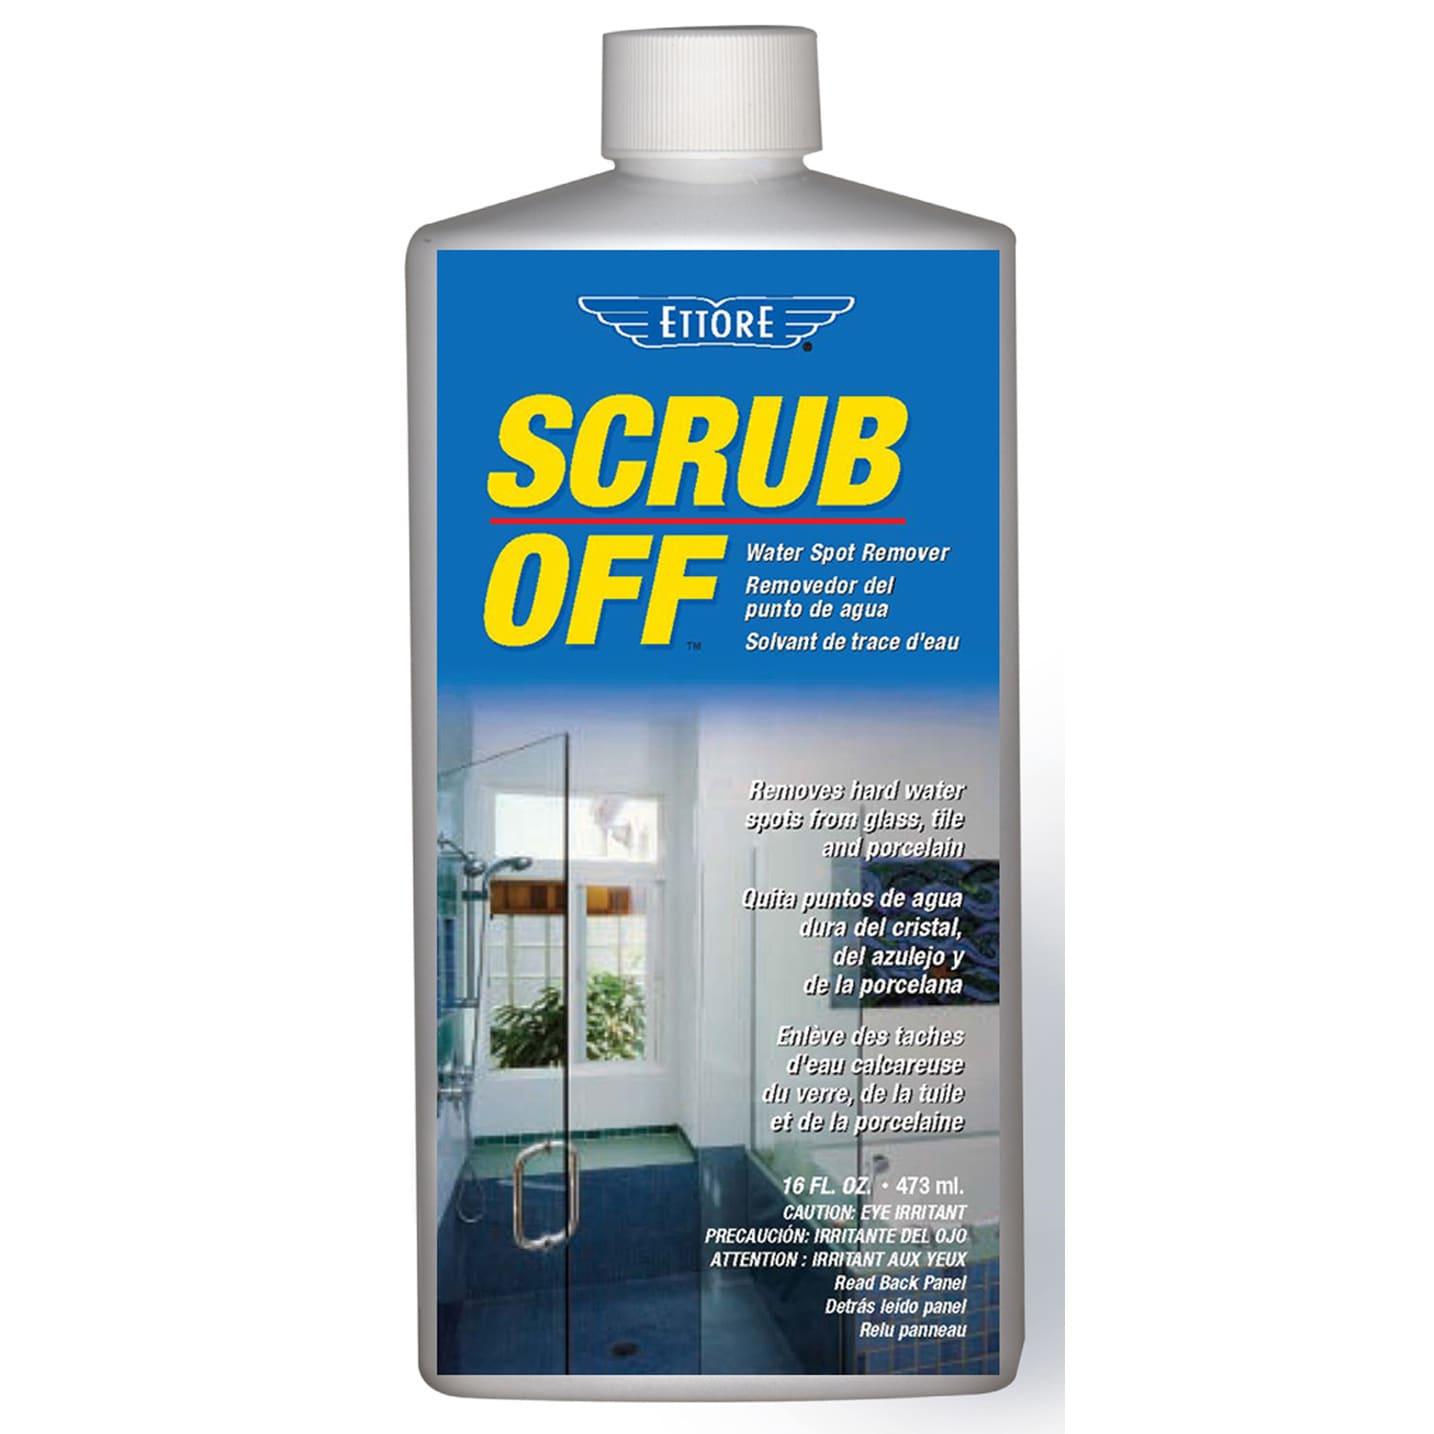 ETTORE 30161 Scrub Off Water Spot Remover (Water Spot Rem...